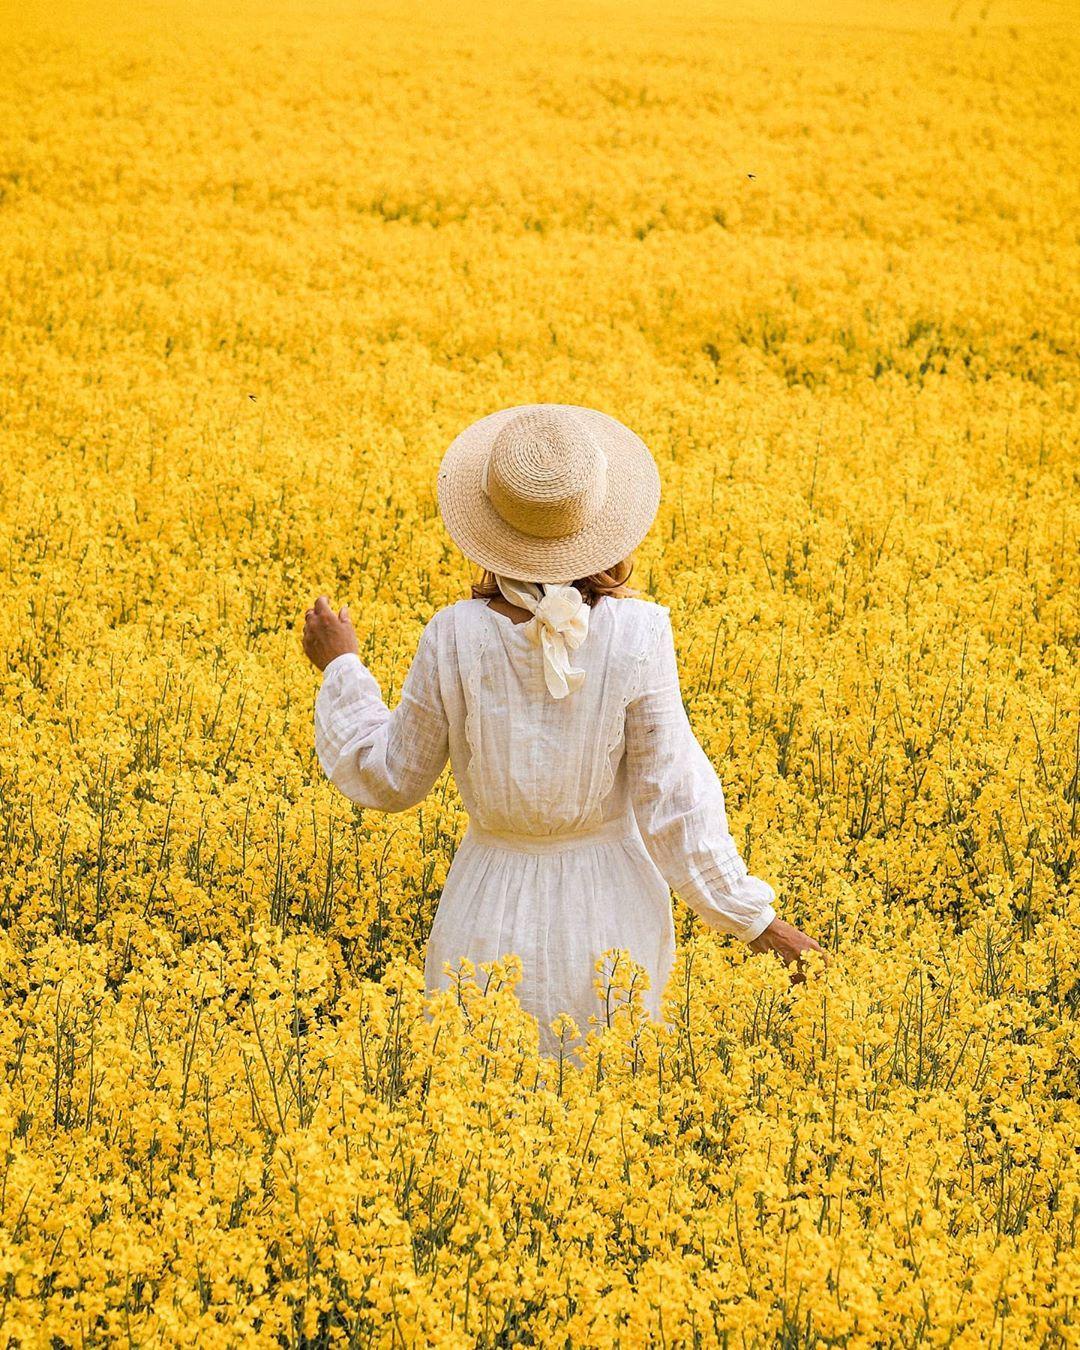 "Stefanie on Instagram: ""My yellow happiness #worldinbloom . . . #floweraddict #tv_flowers #tv_fadingbeauty #sheisnotlost #myseasonalstory #canondeutschland…"""